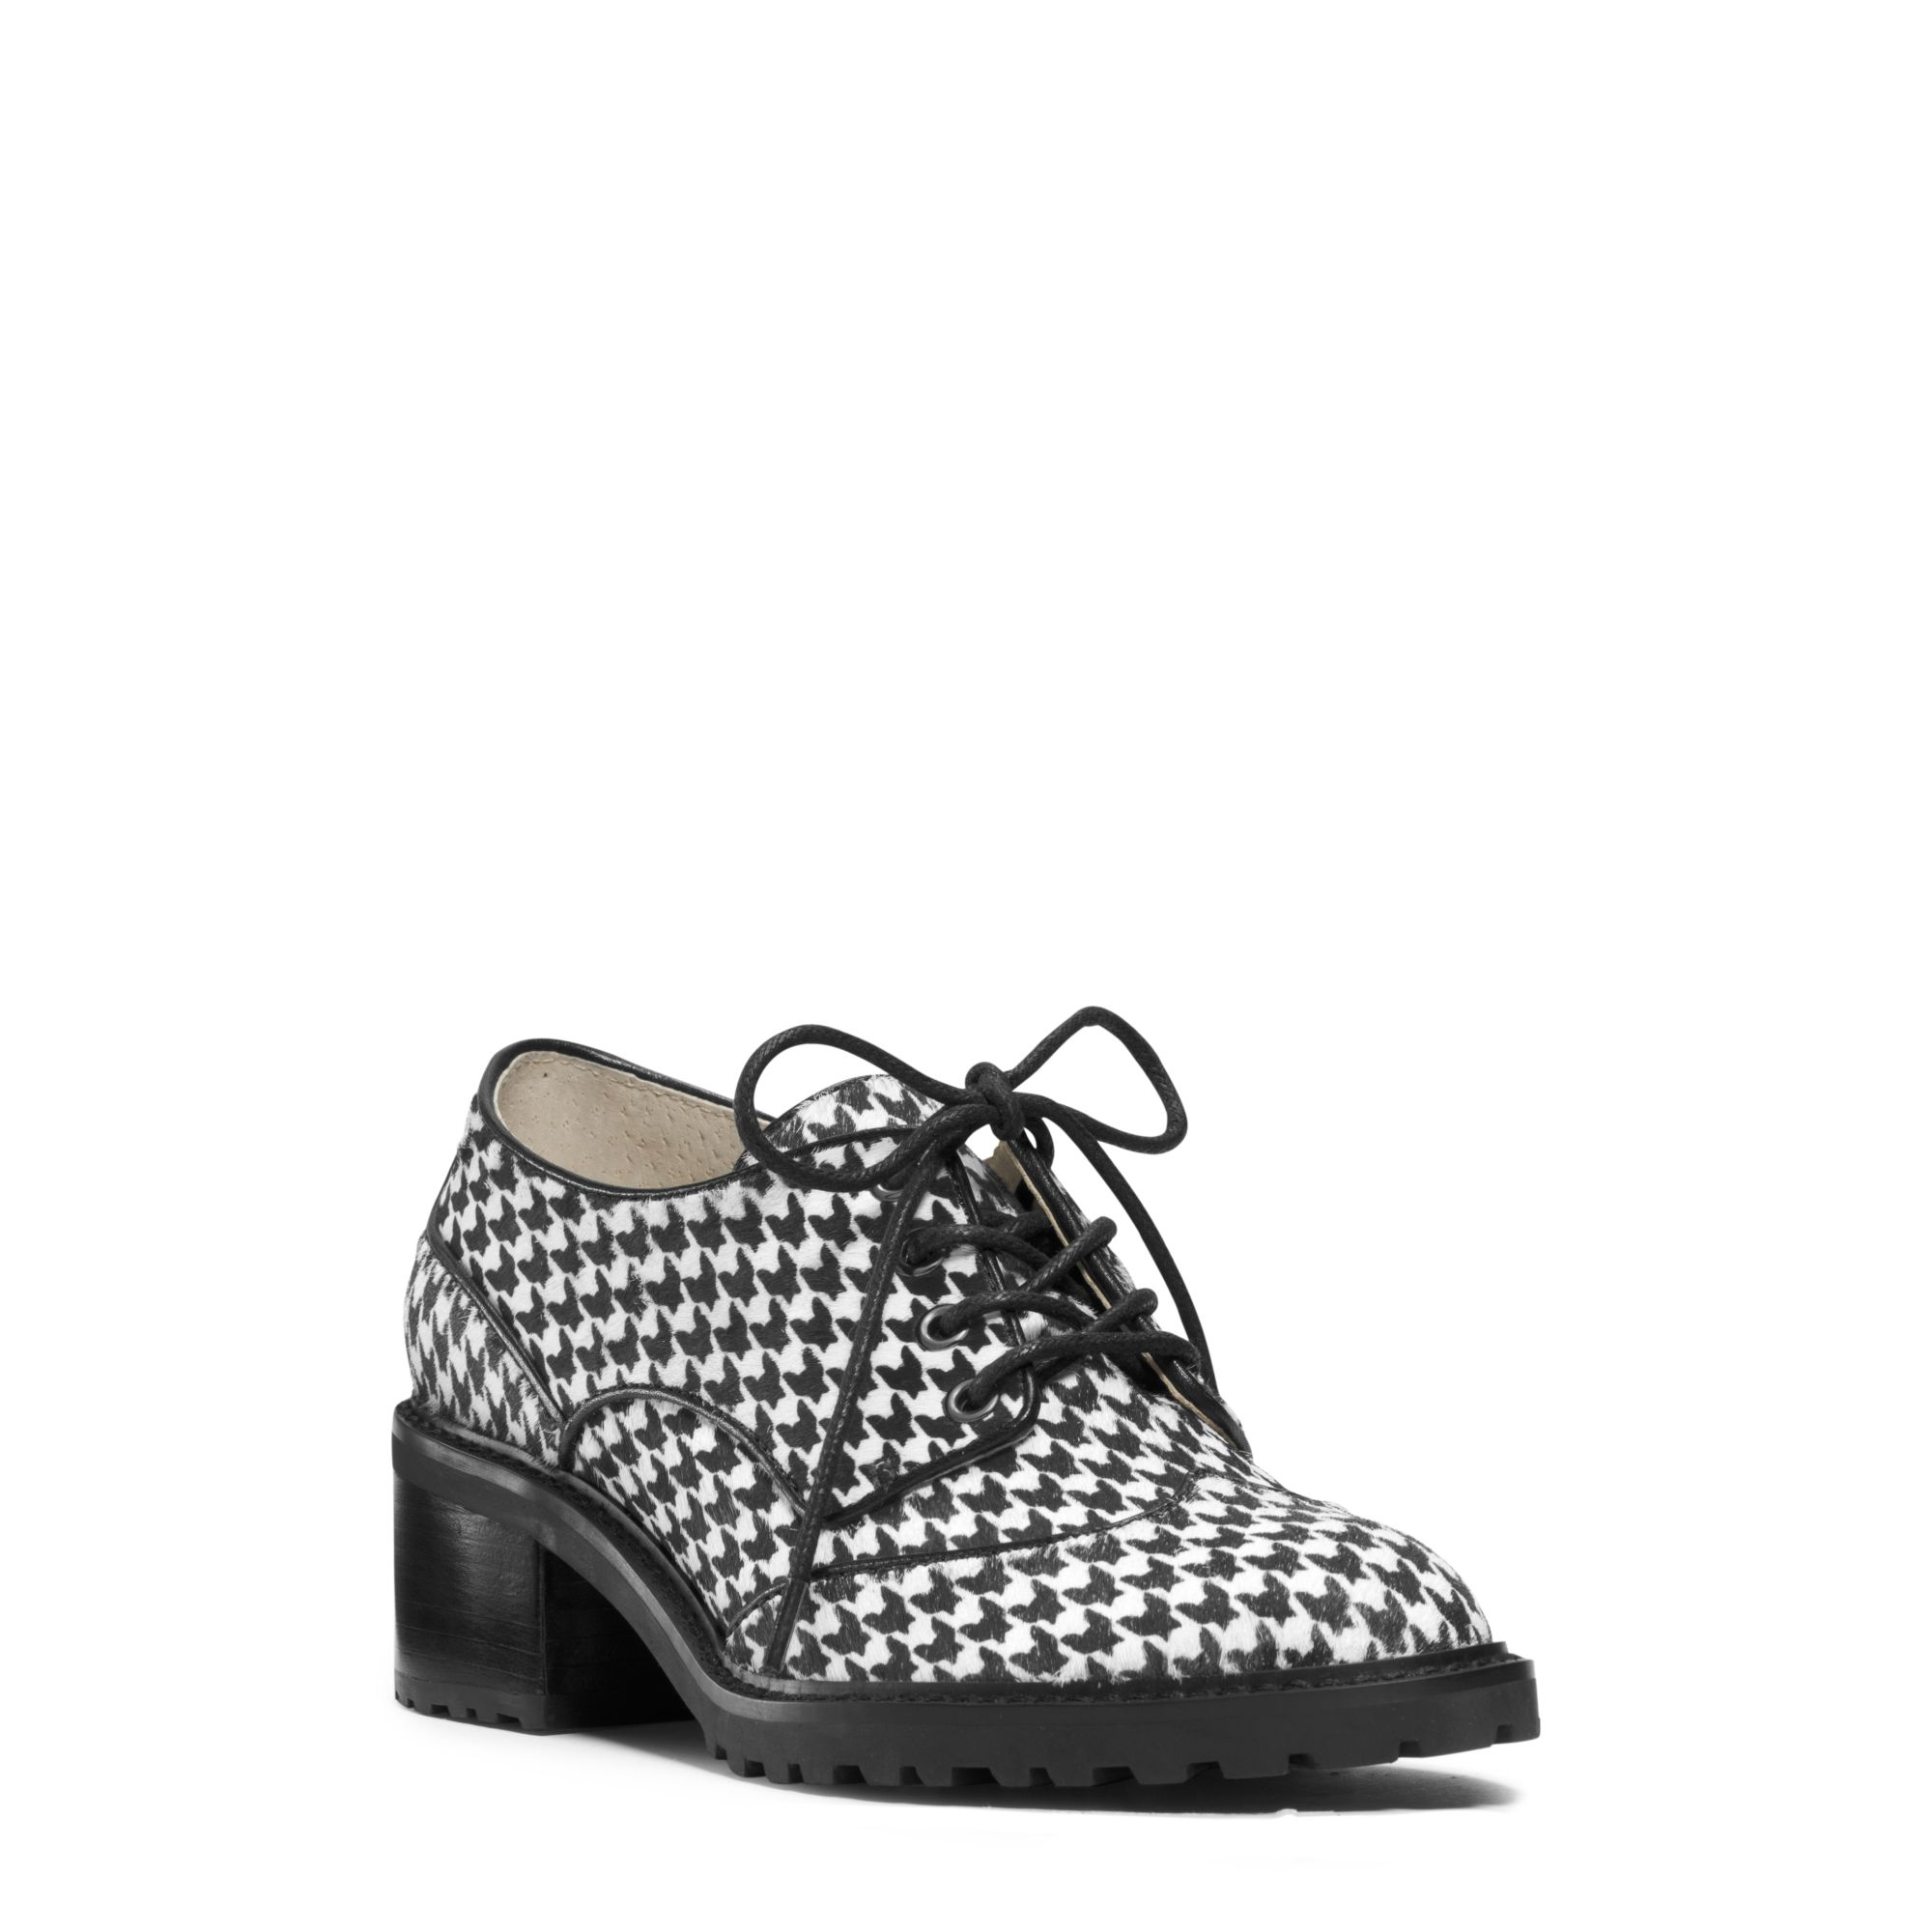 Moncler Womens Designer Shoes